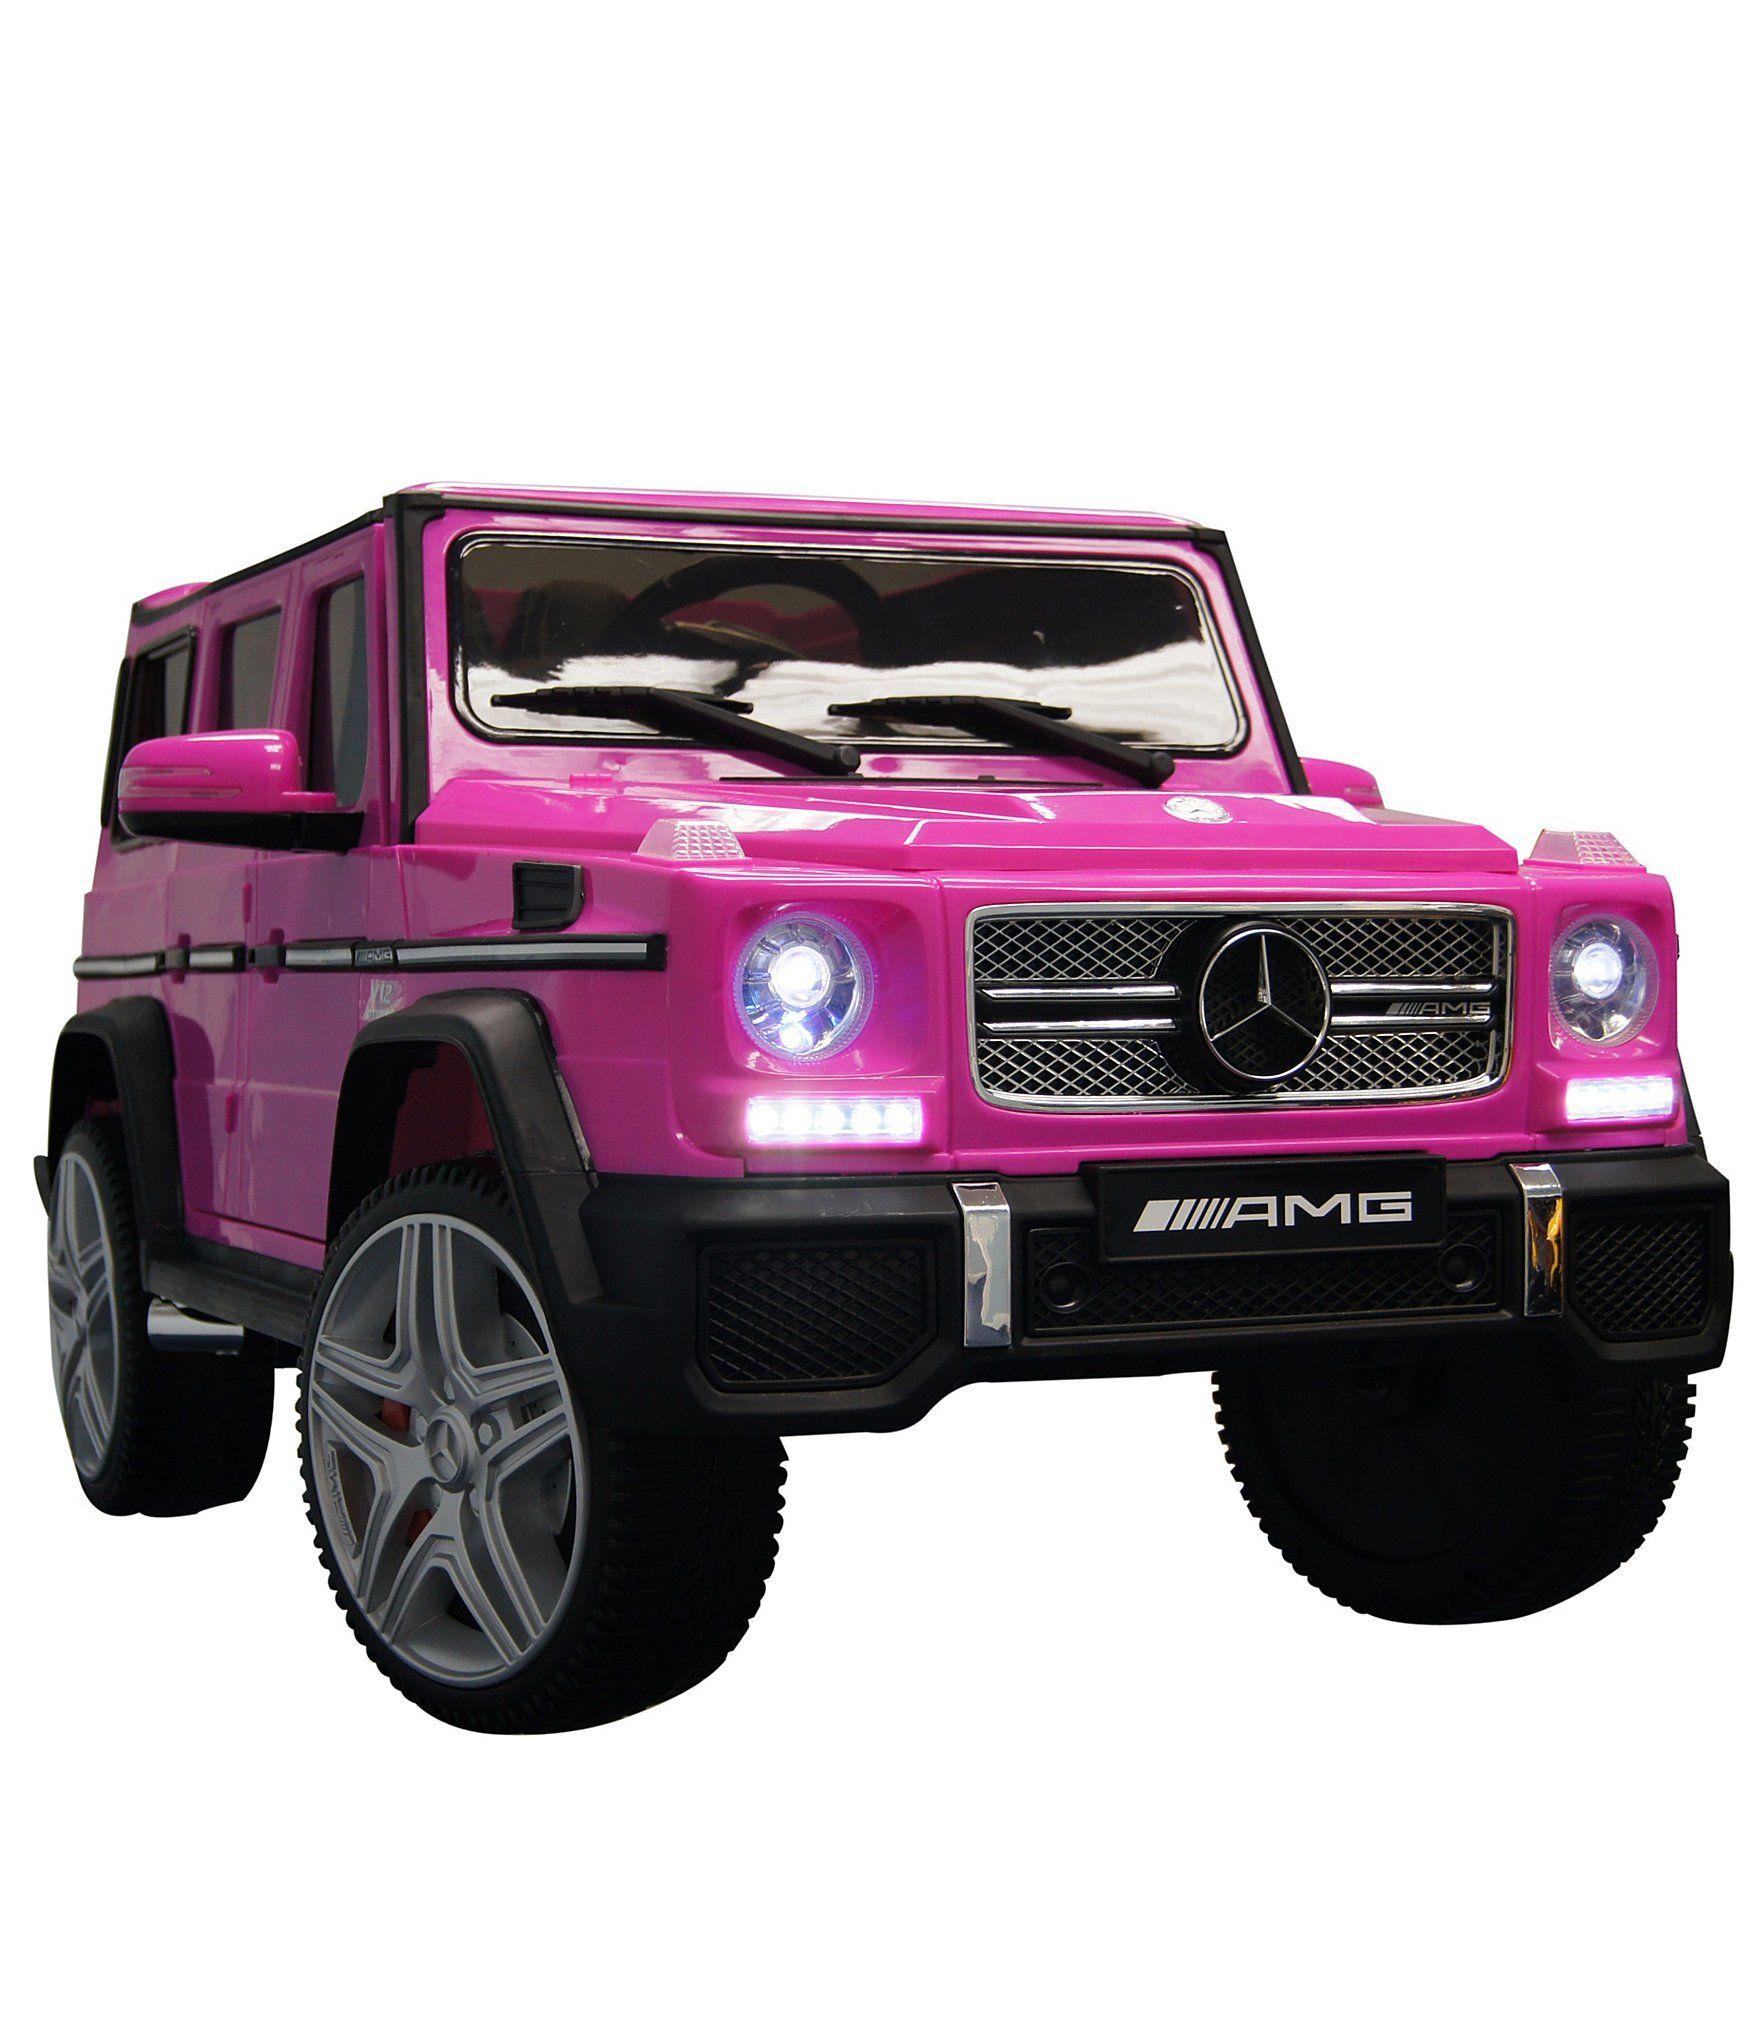 Best Ride On Cars Mercedes G65 12v Ride 045 On Car Pink In 2020 Toy Cars For Kids Kids Ride On Ride On Toys